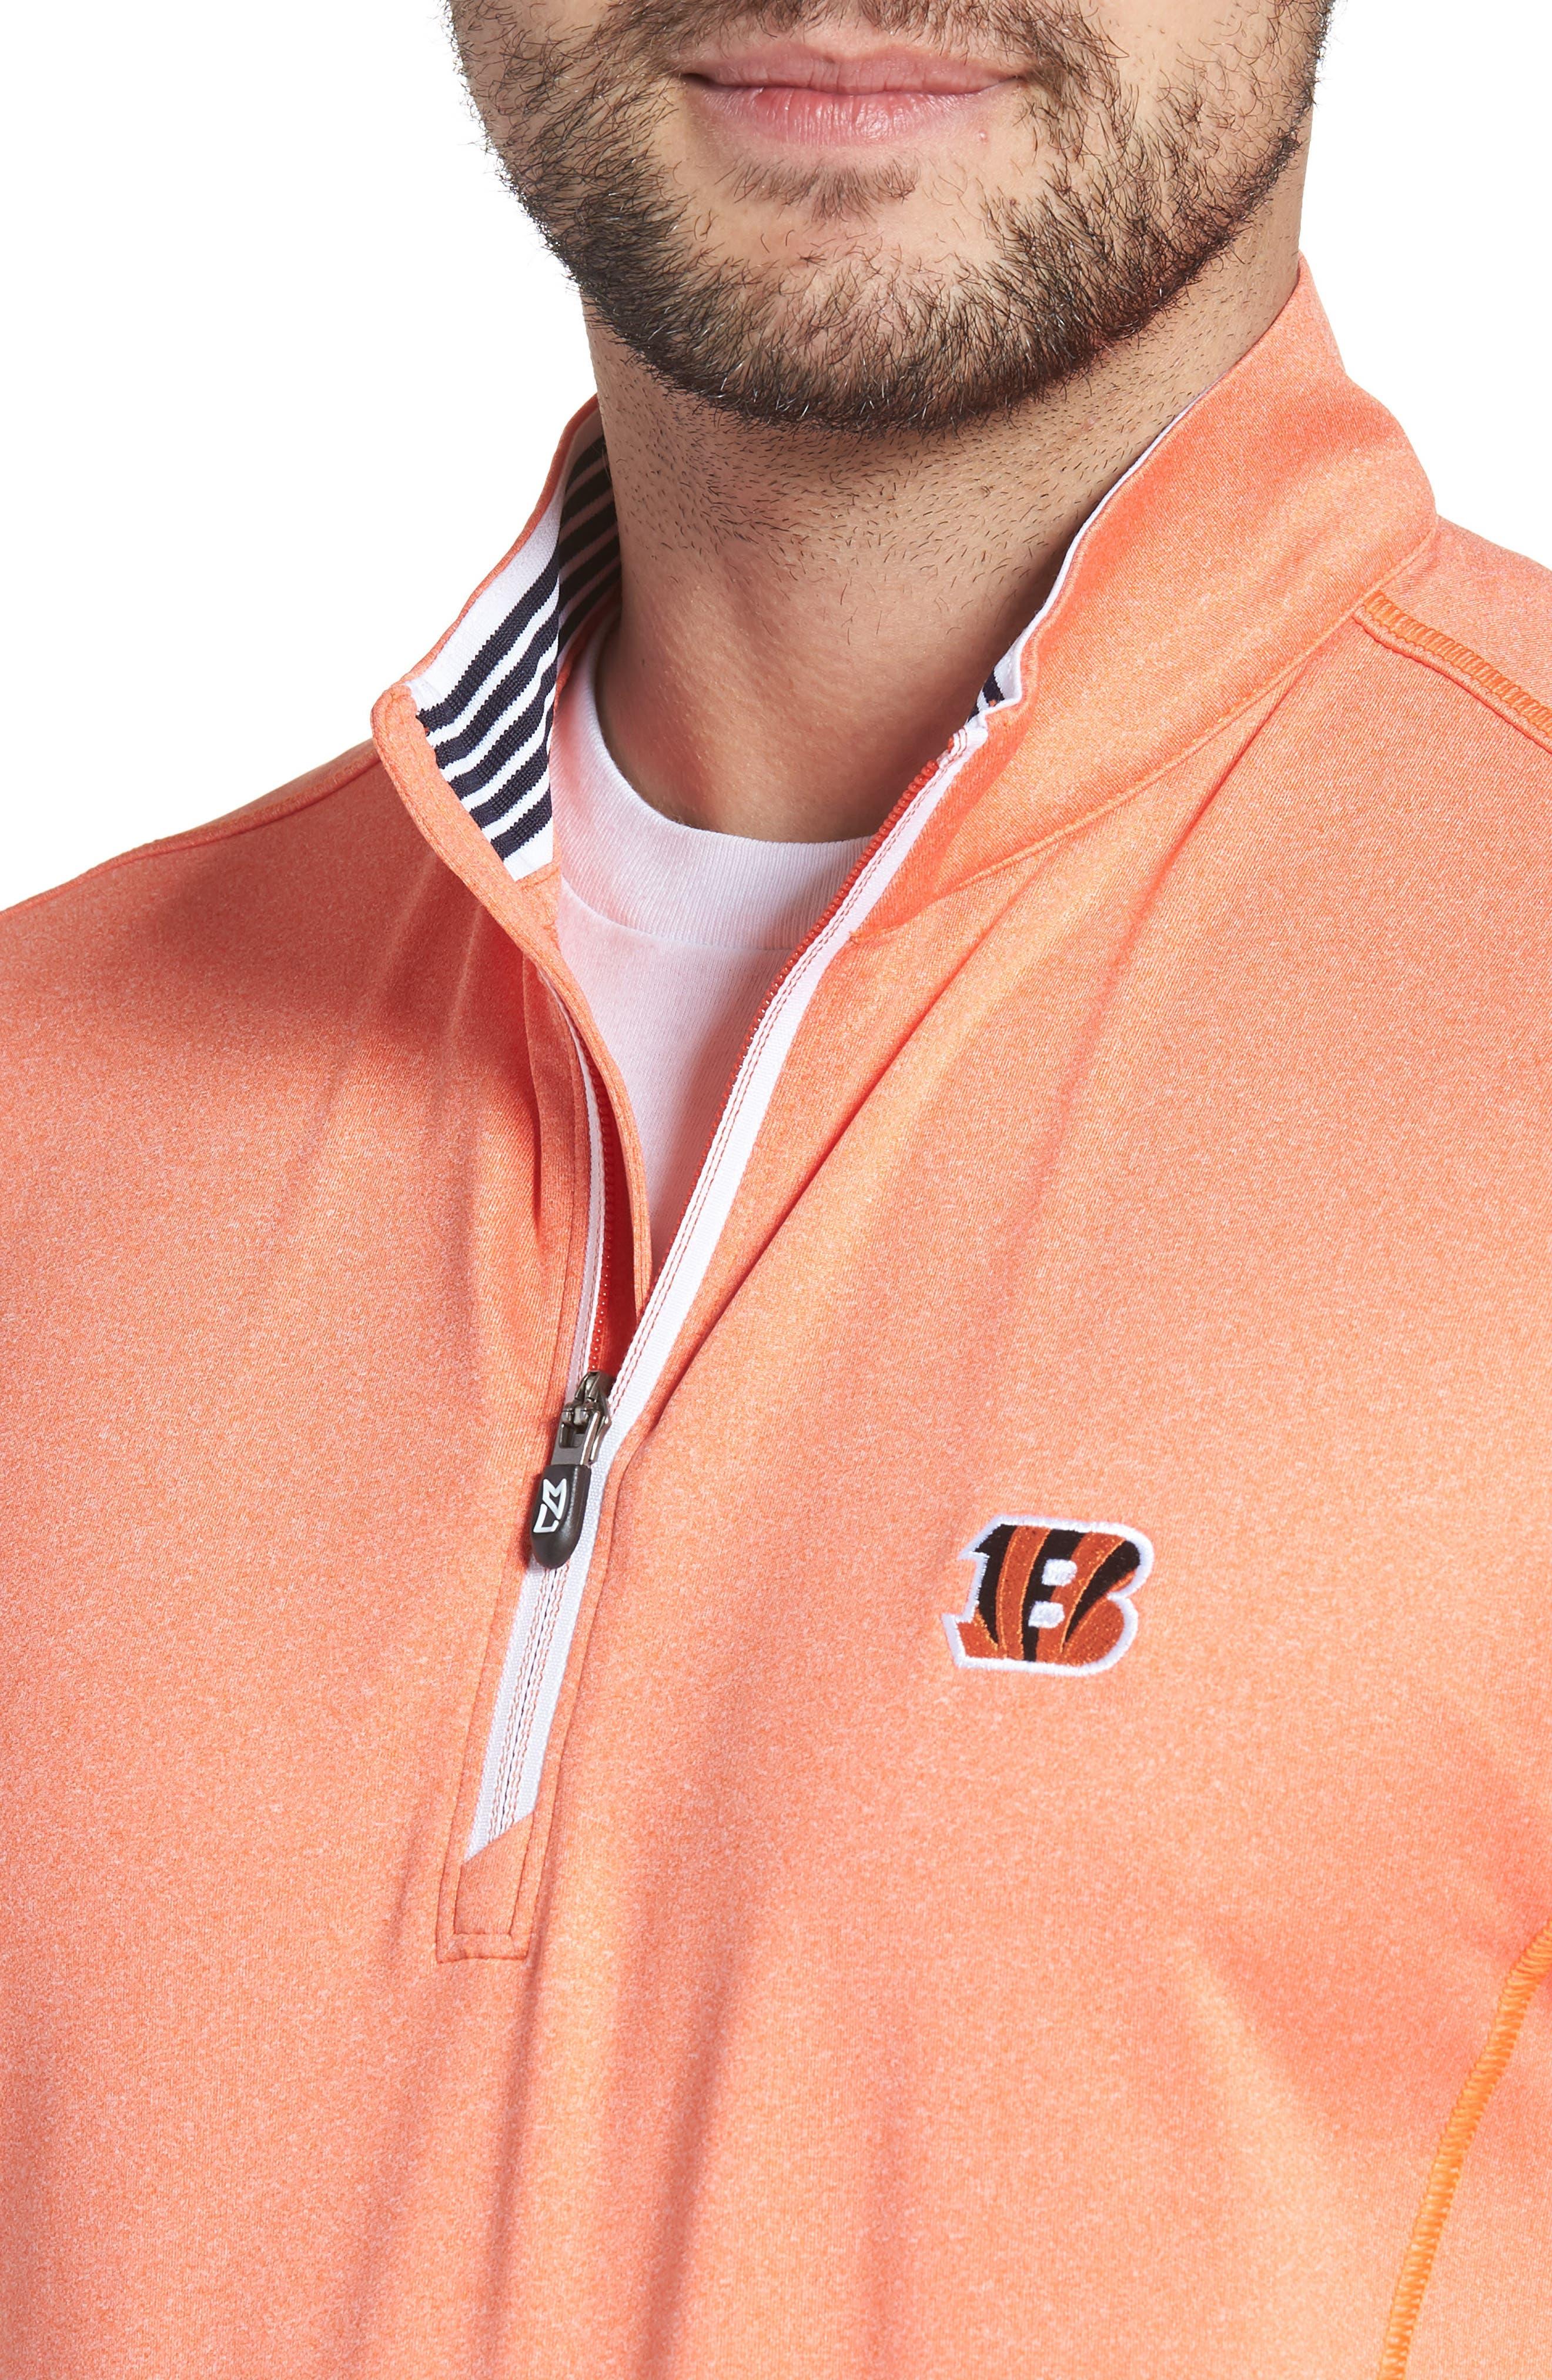 Endurance Cincinnati Bengals Regular Fit Pullover,                             Alternate thumbnail 4, color,                             COLLEGE ORANGE HEATHER